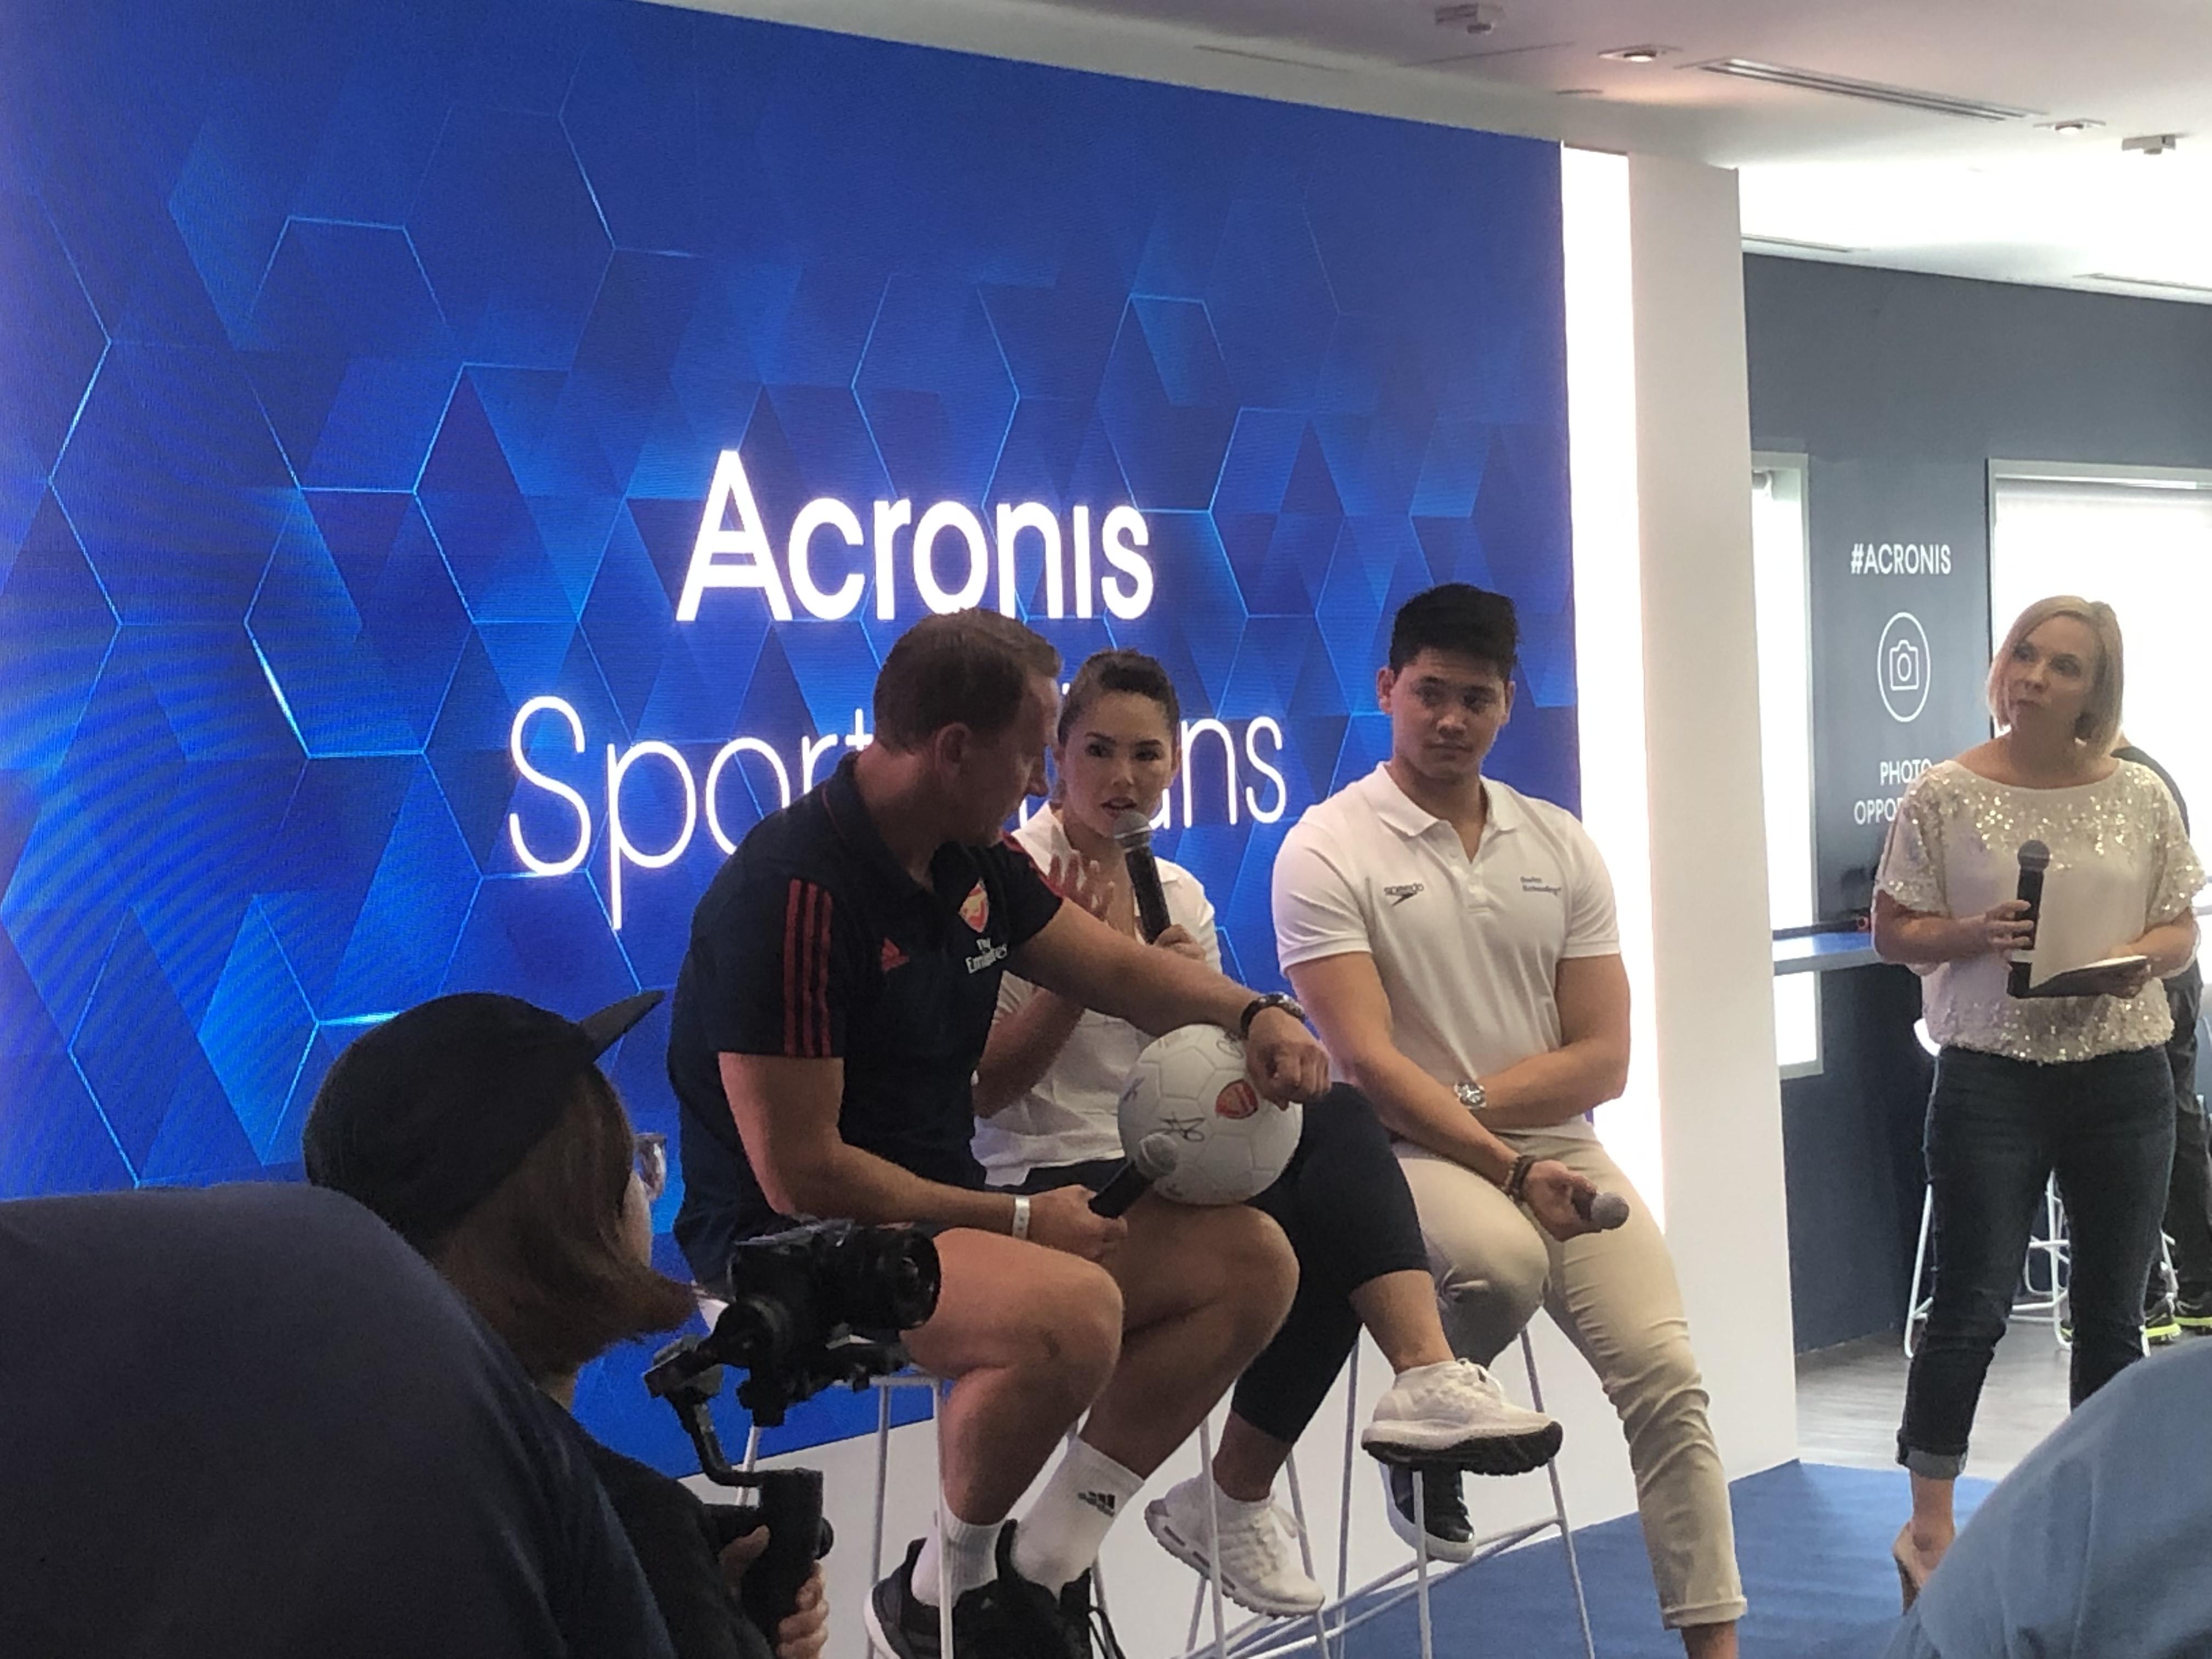 Acronis sports titan event